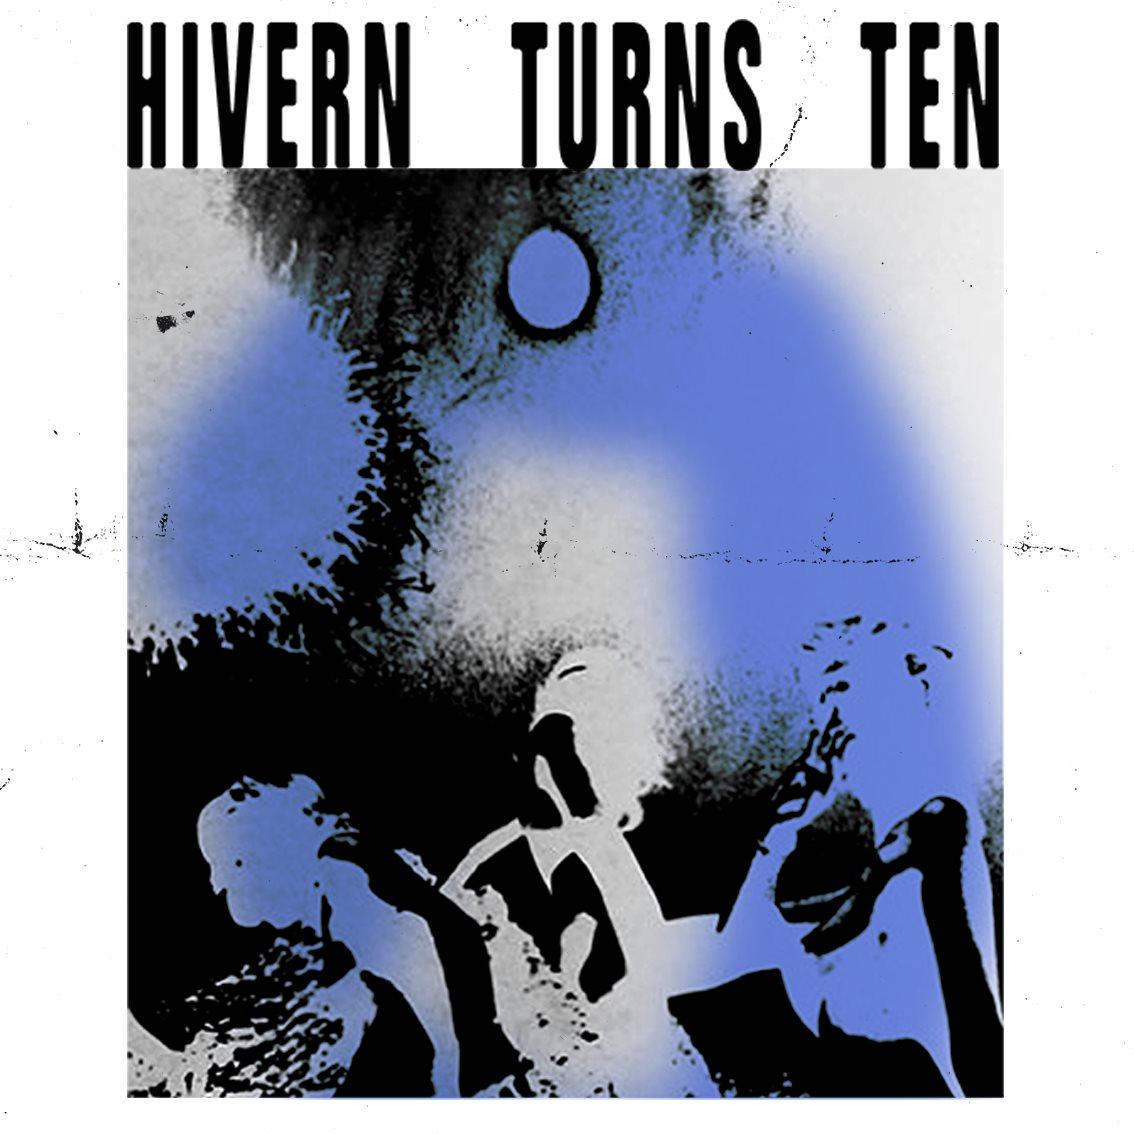 Hivern Turns Ten - Flyer back